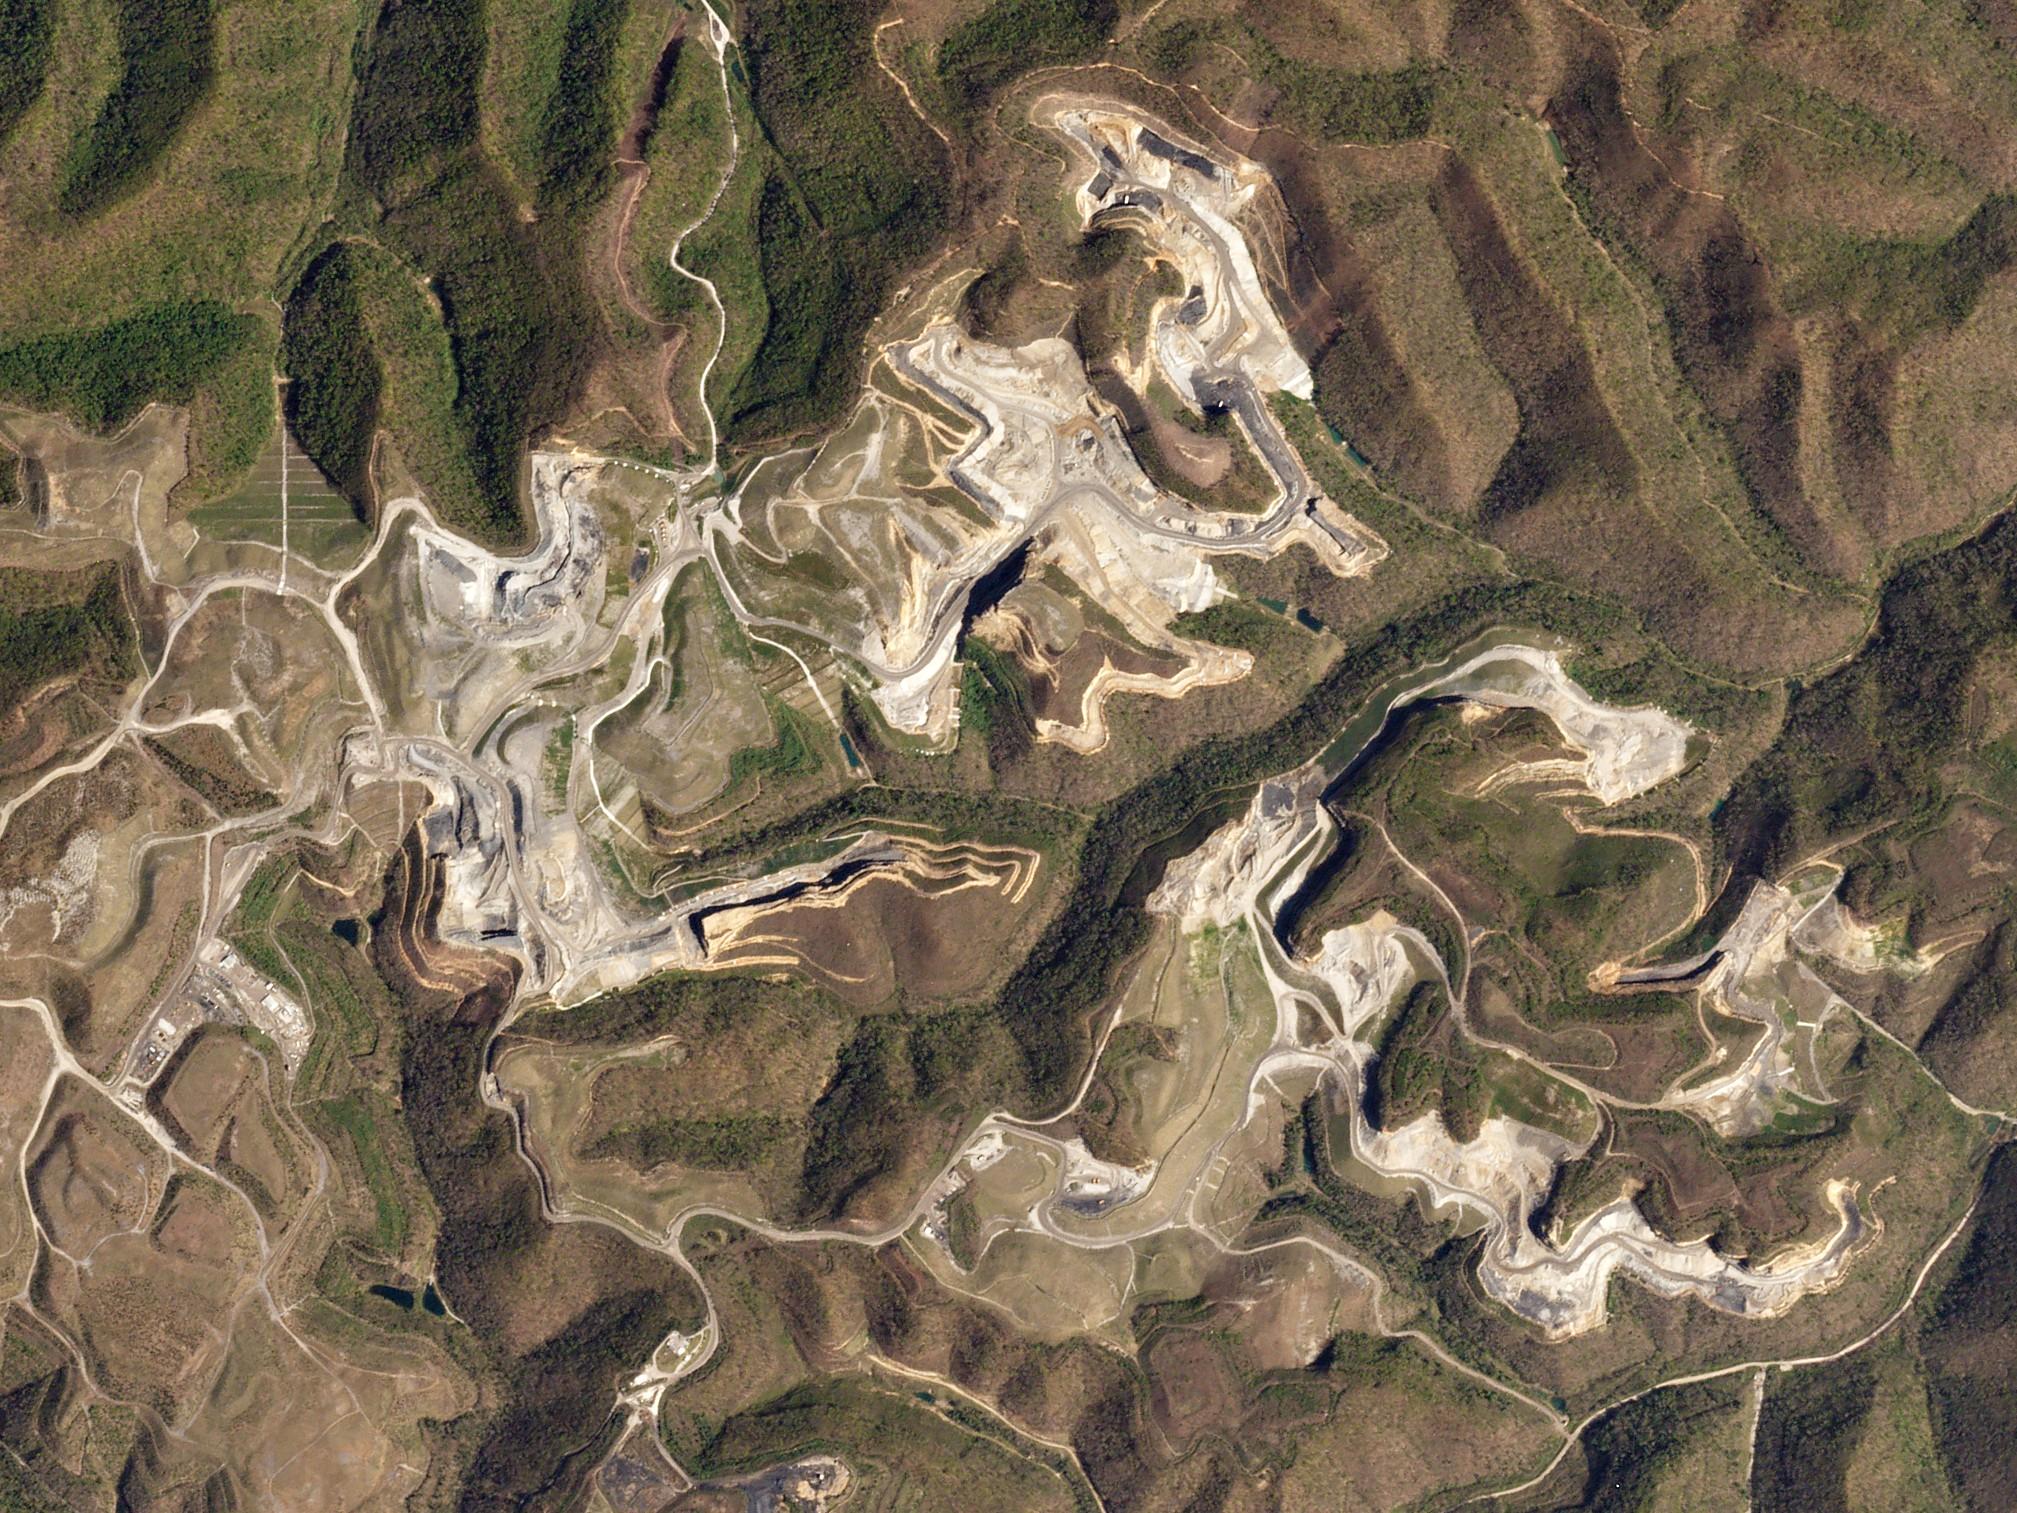 coal-mines-20160609-full.jpg